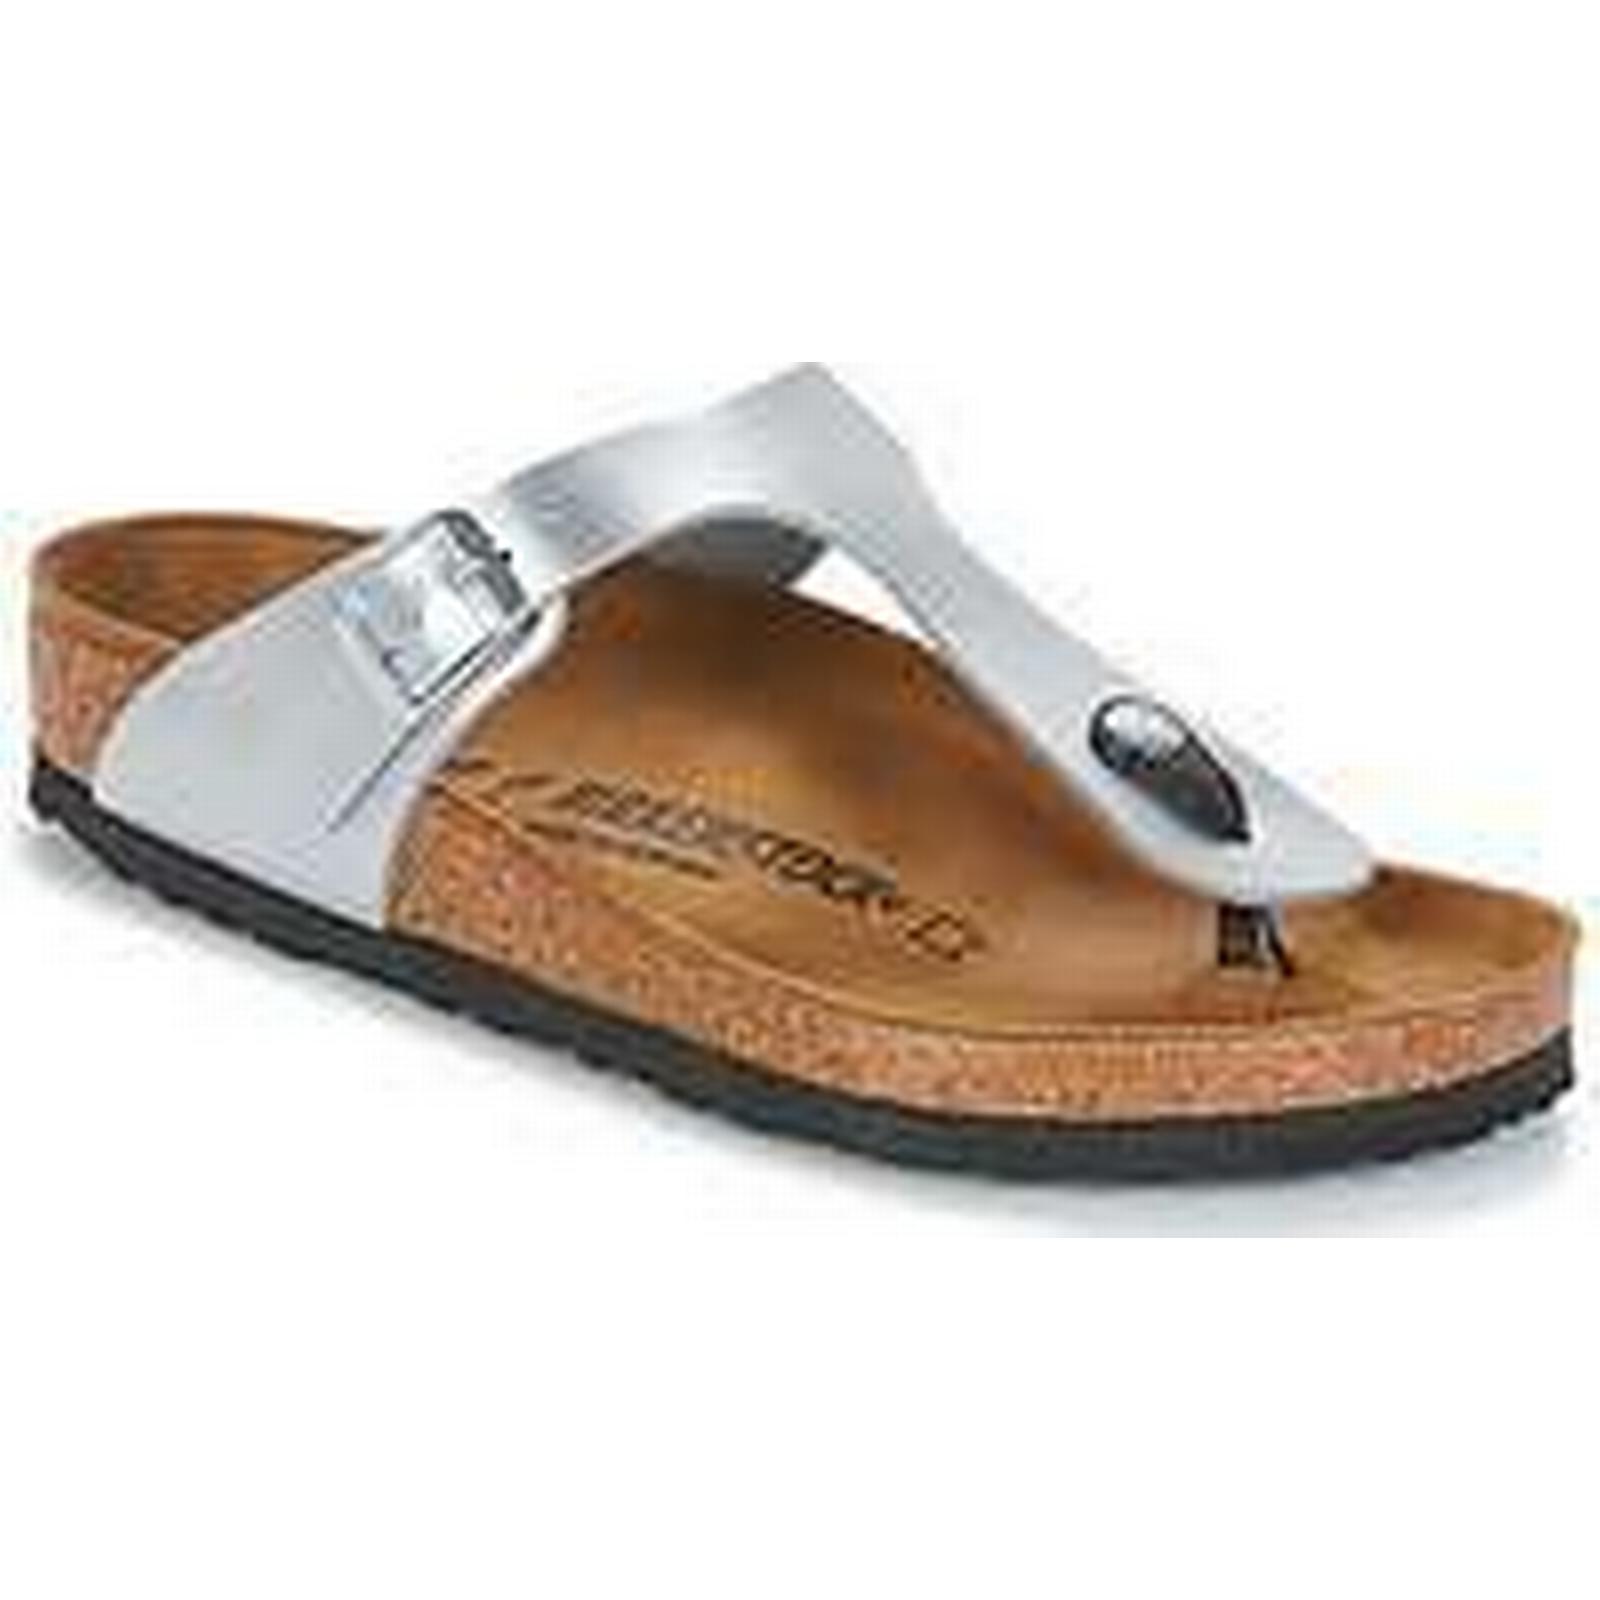 Spartoo.co.uk Birkenstock / GIZEH women's Flip flops / Birkenstock Sandals (Shoes) in Silver 64d9bf